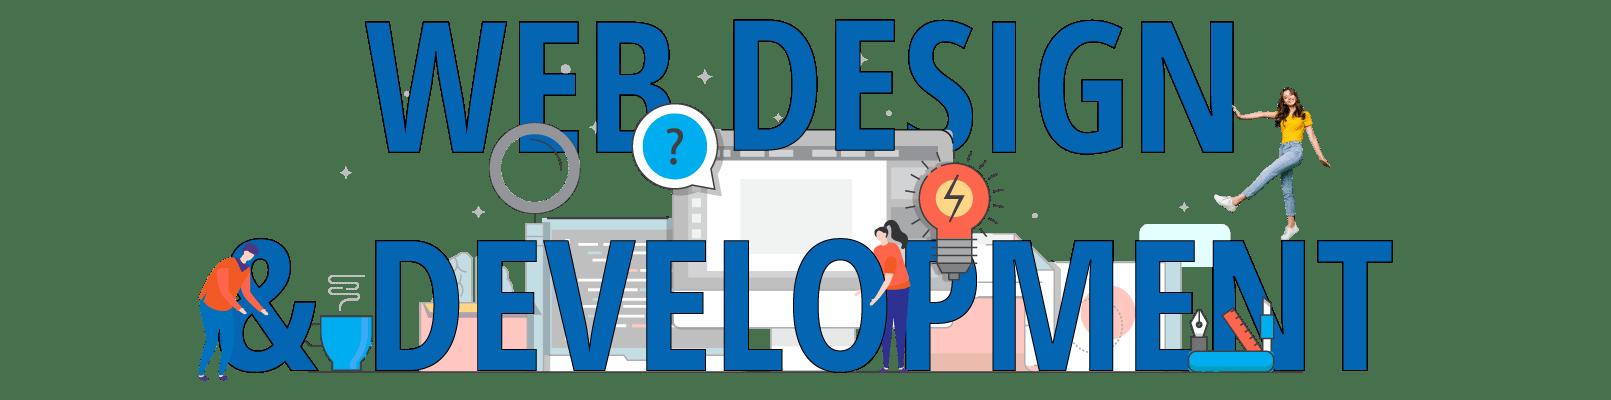 web-design-1-min